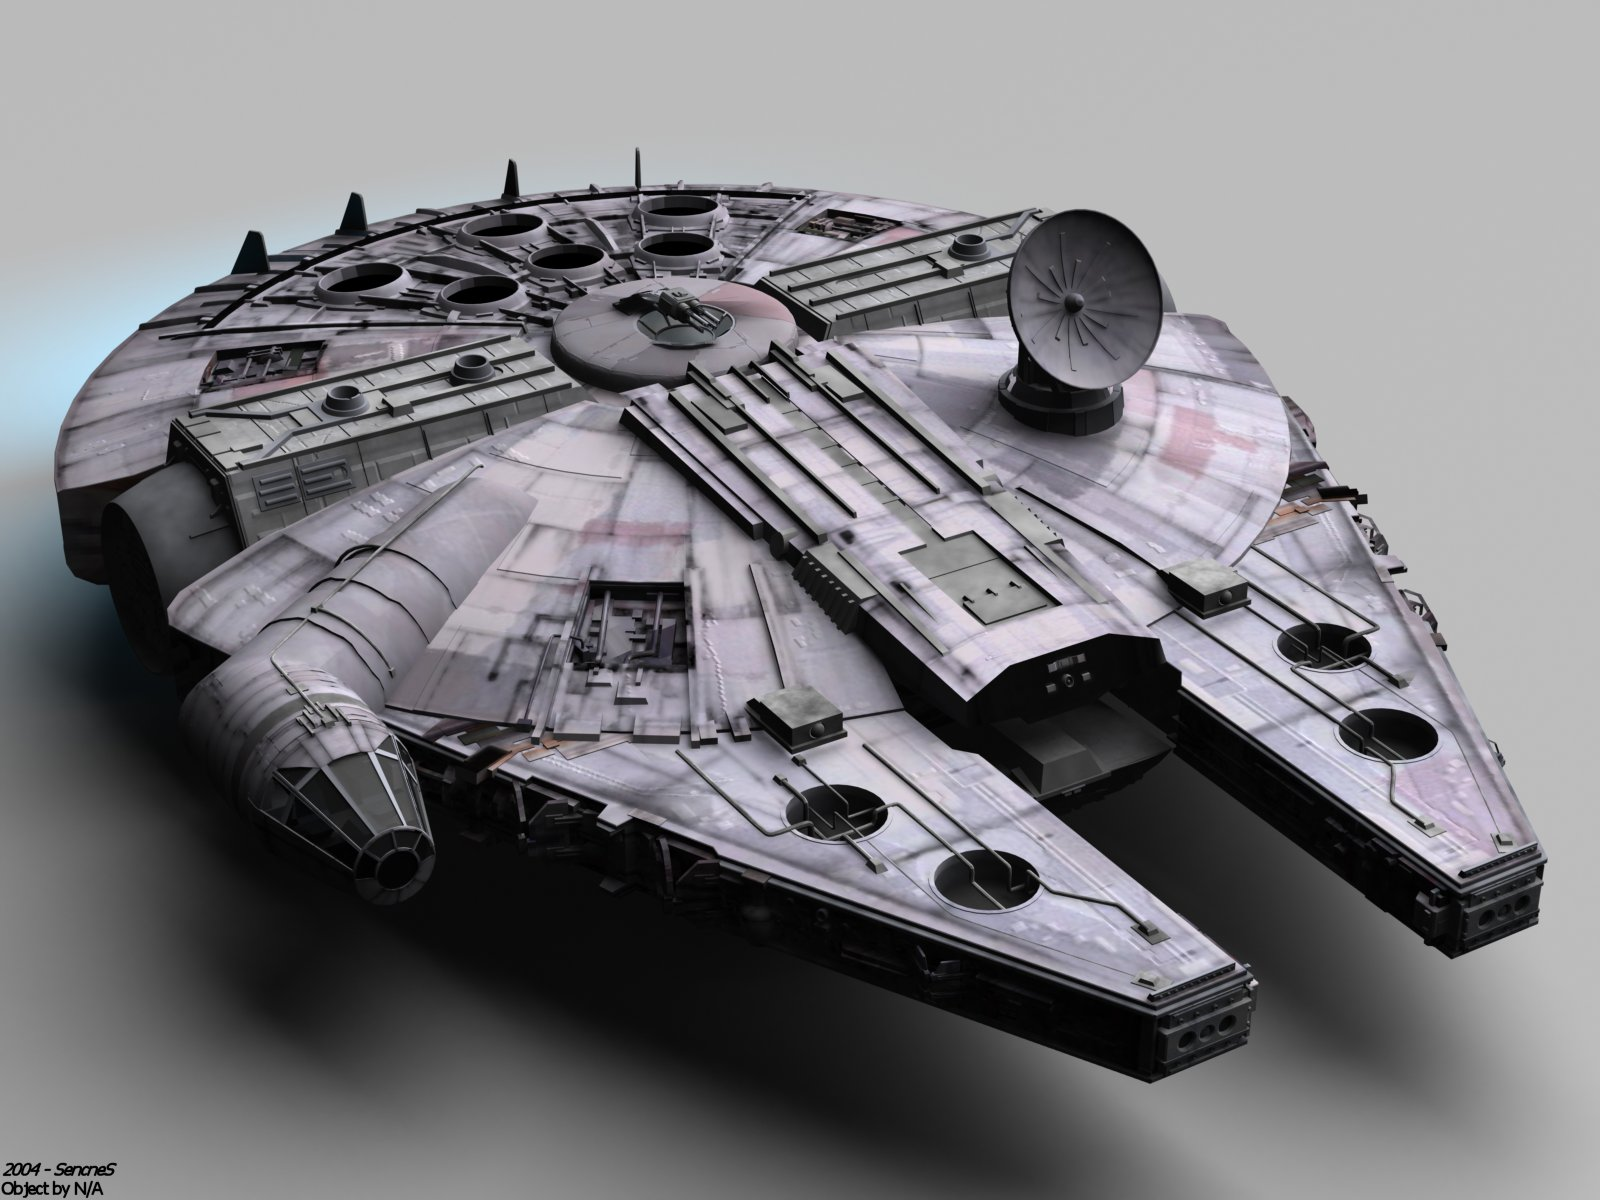 Star Wars Millennium Falcon by SencneS 1600x1200